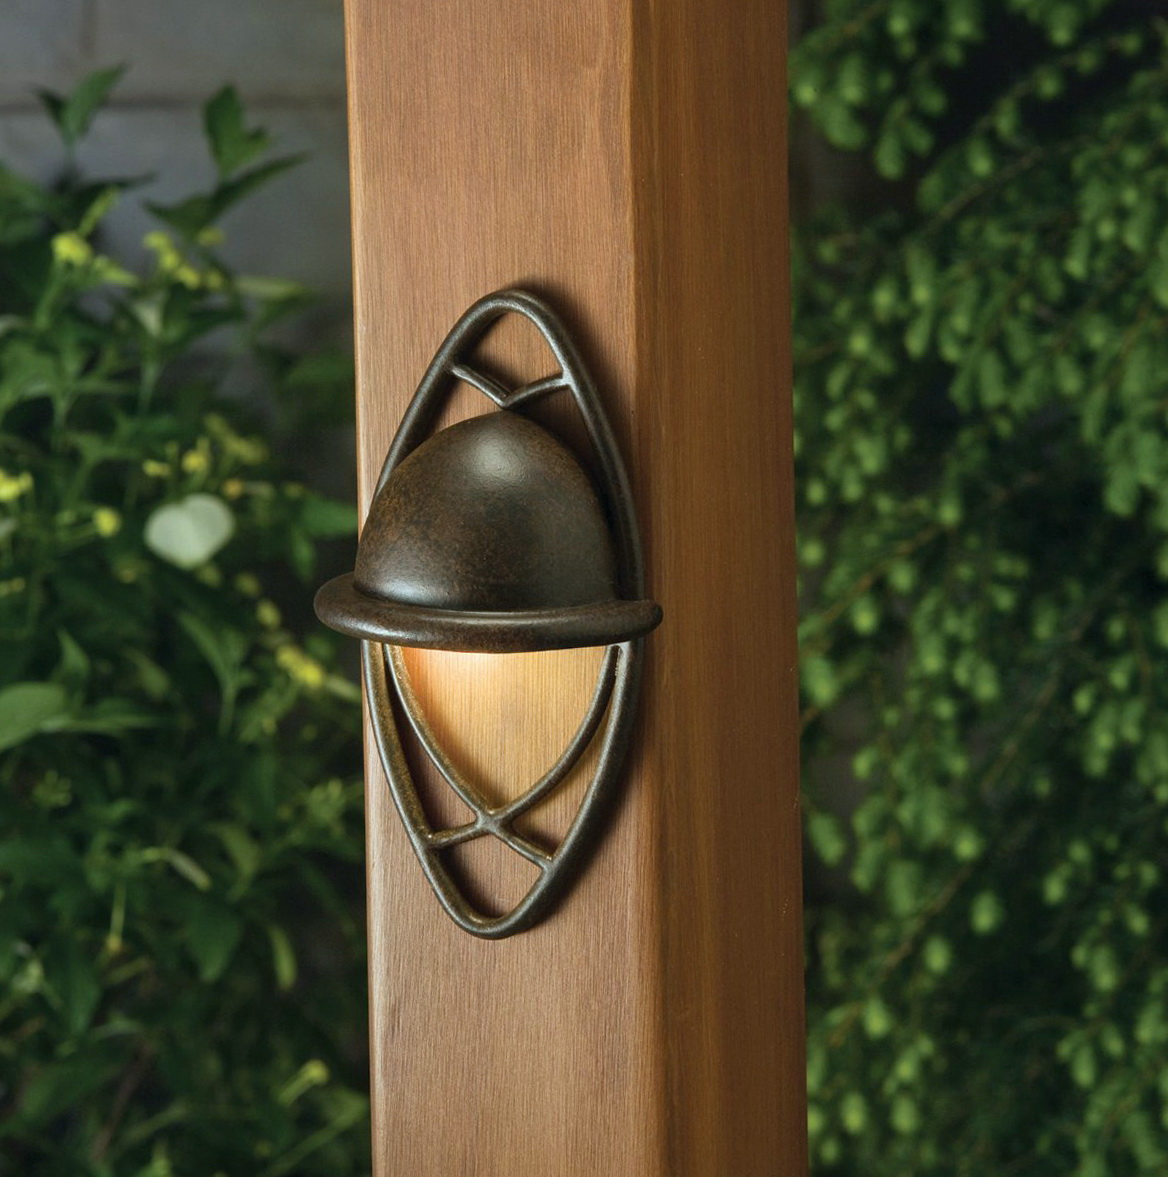 Deck Rail Lighting Kits Home Design Ideas